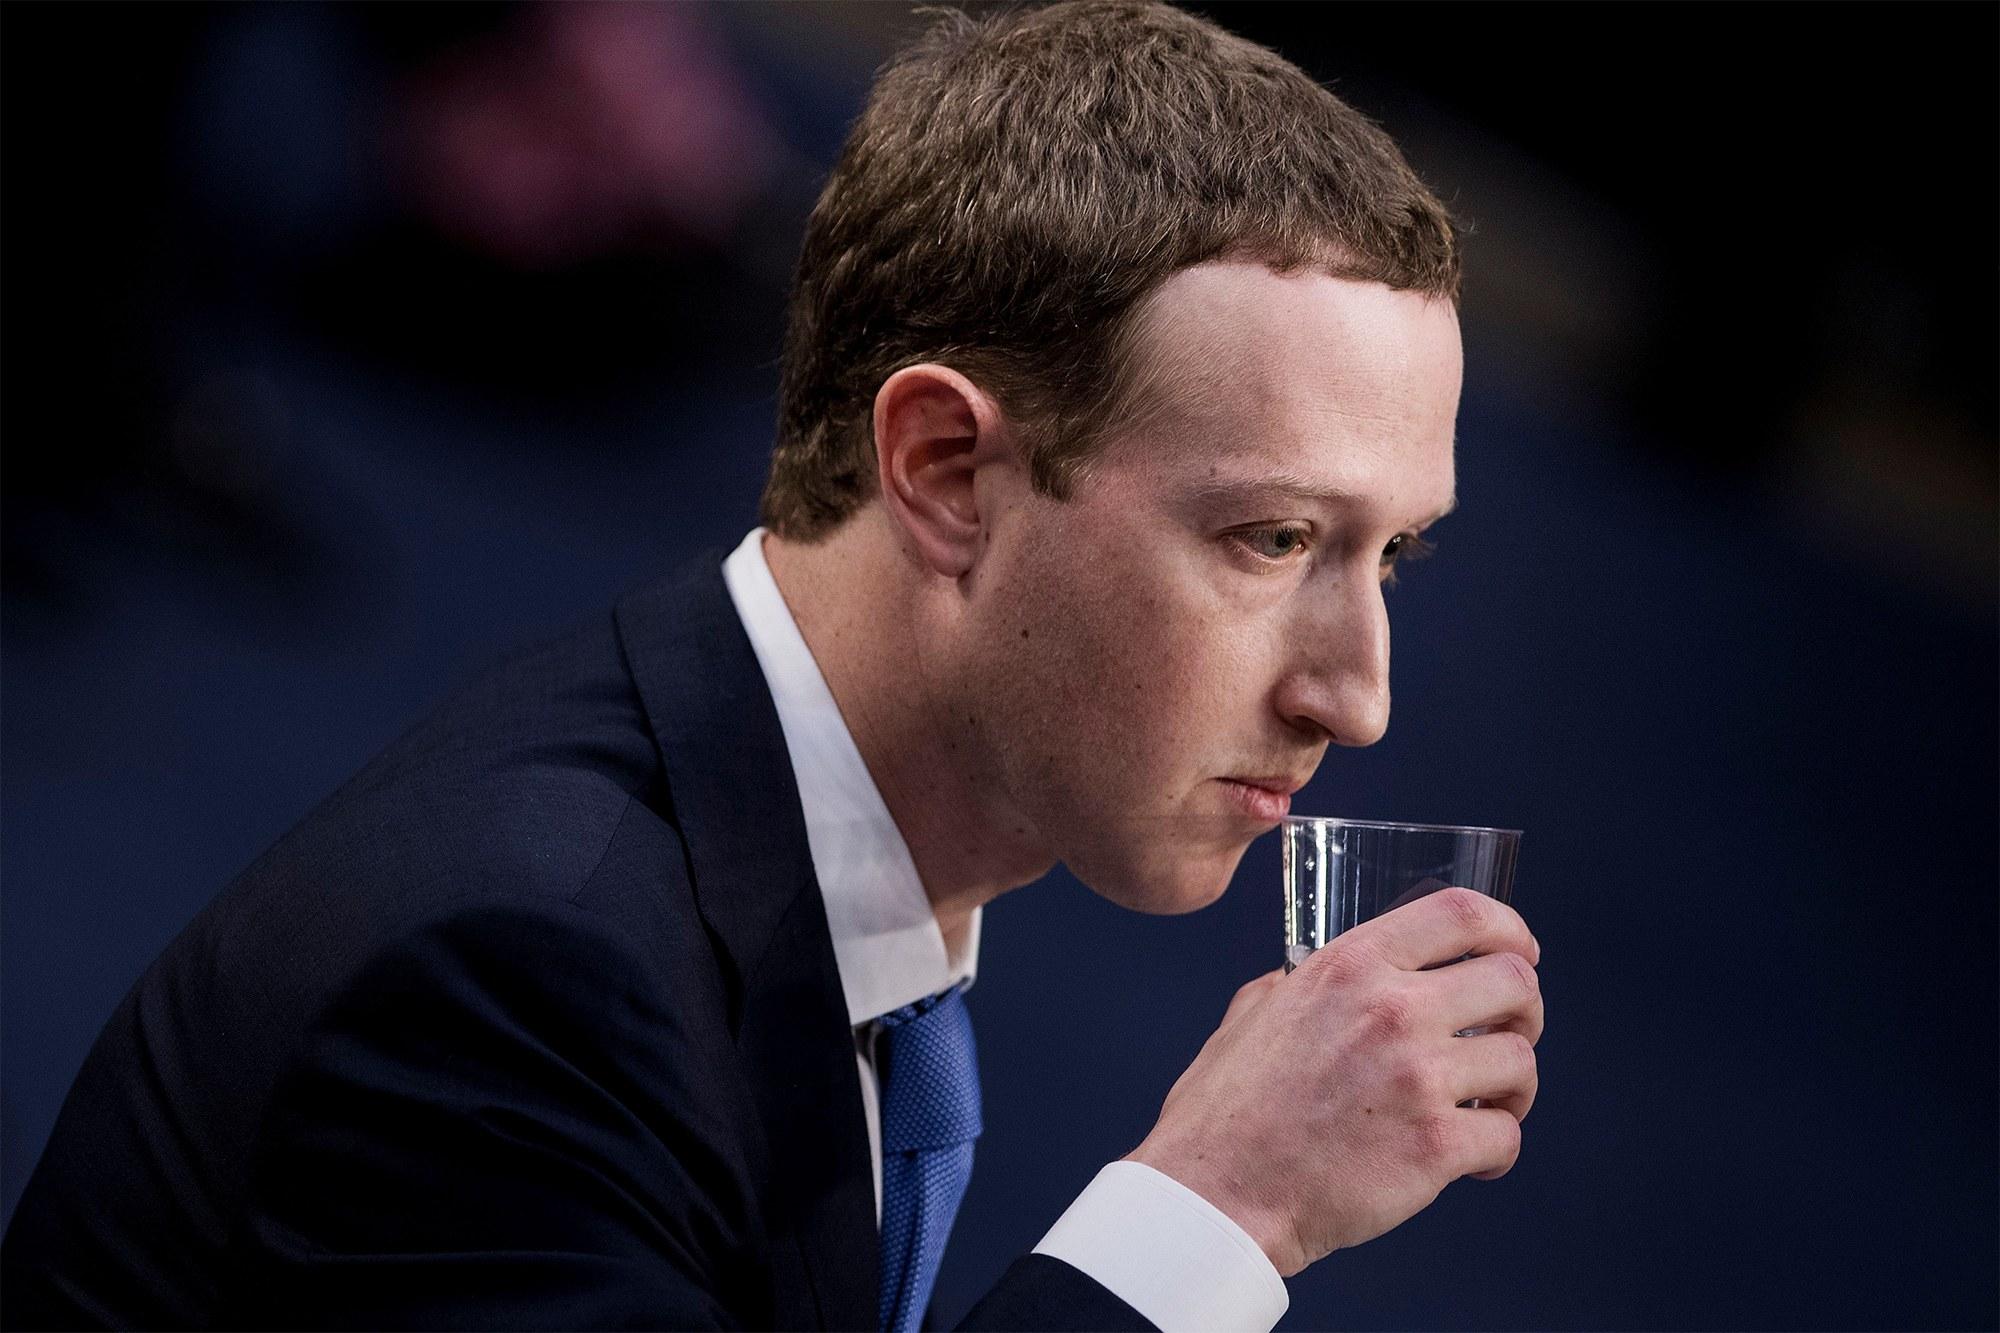 mark zuckerberg'ün senatodaki ifadesi